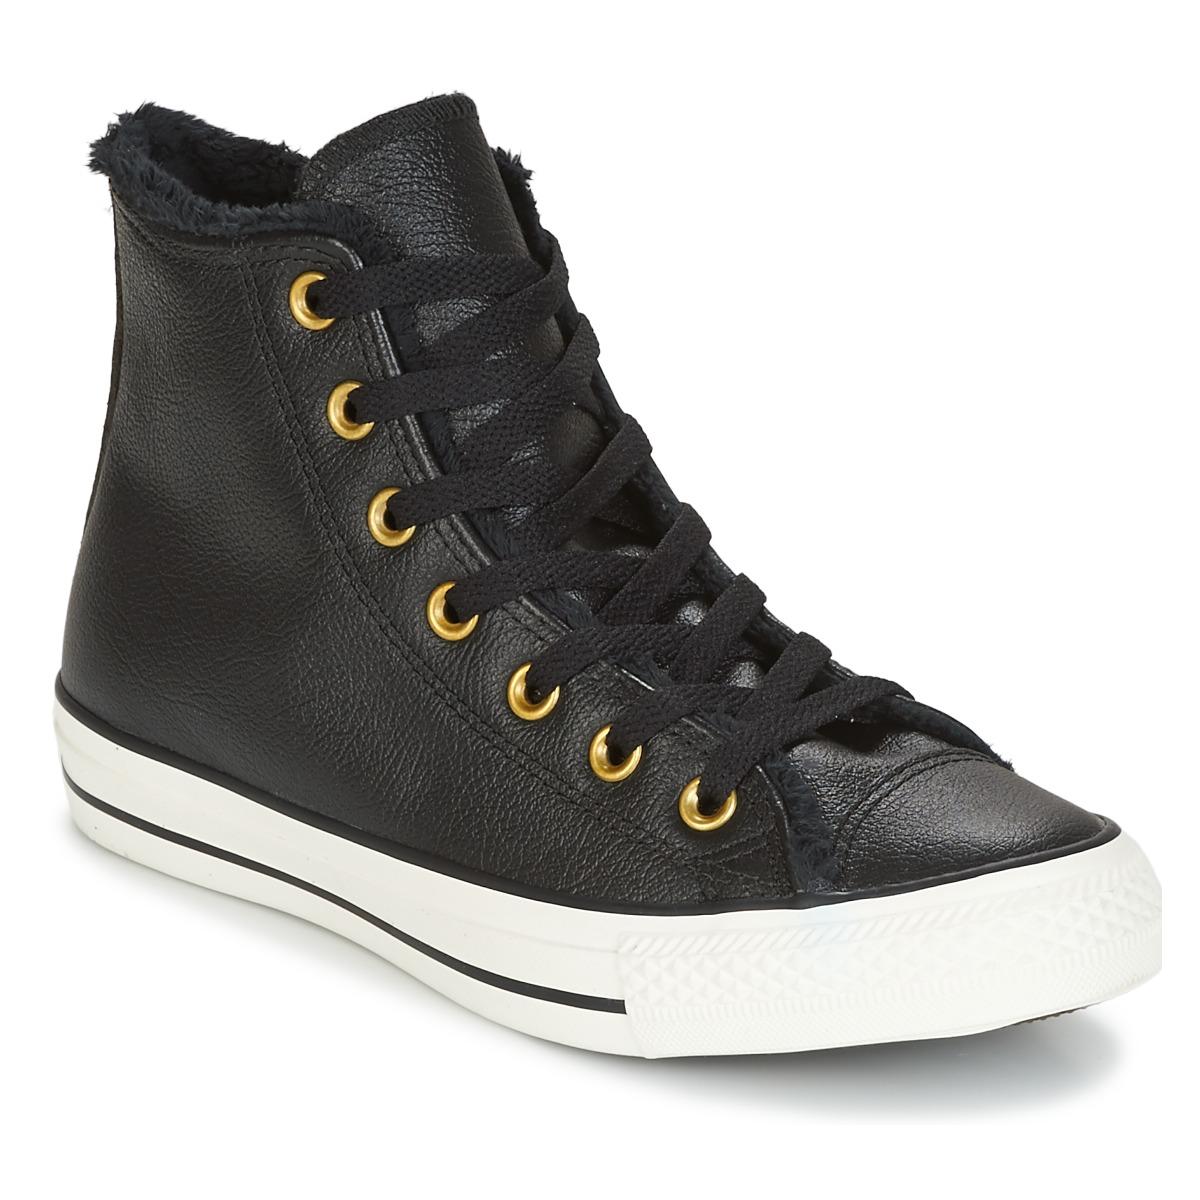 Converse CHUCK TAYLOR ALL STAR LEATHER + FUR HI BLACK/BLACK/EGRET musta - Baskets Femme Spartoo